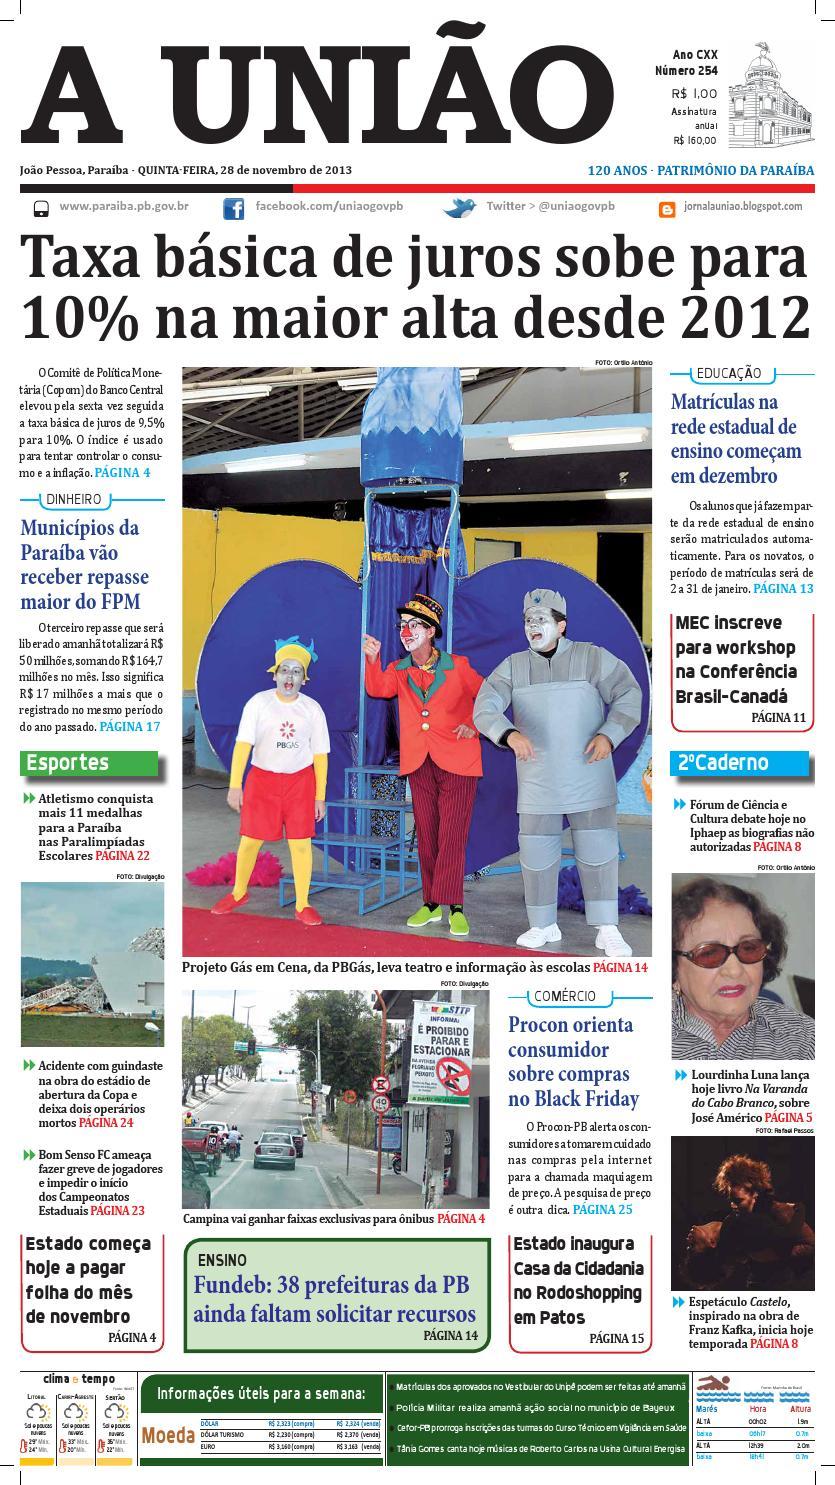 Jornal A União by Jornal A União - issuu 4ca9556e96